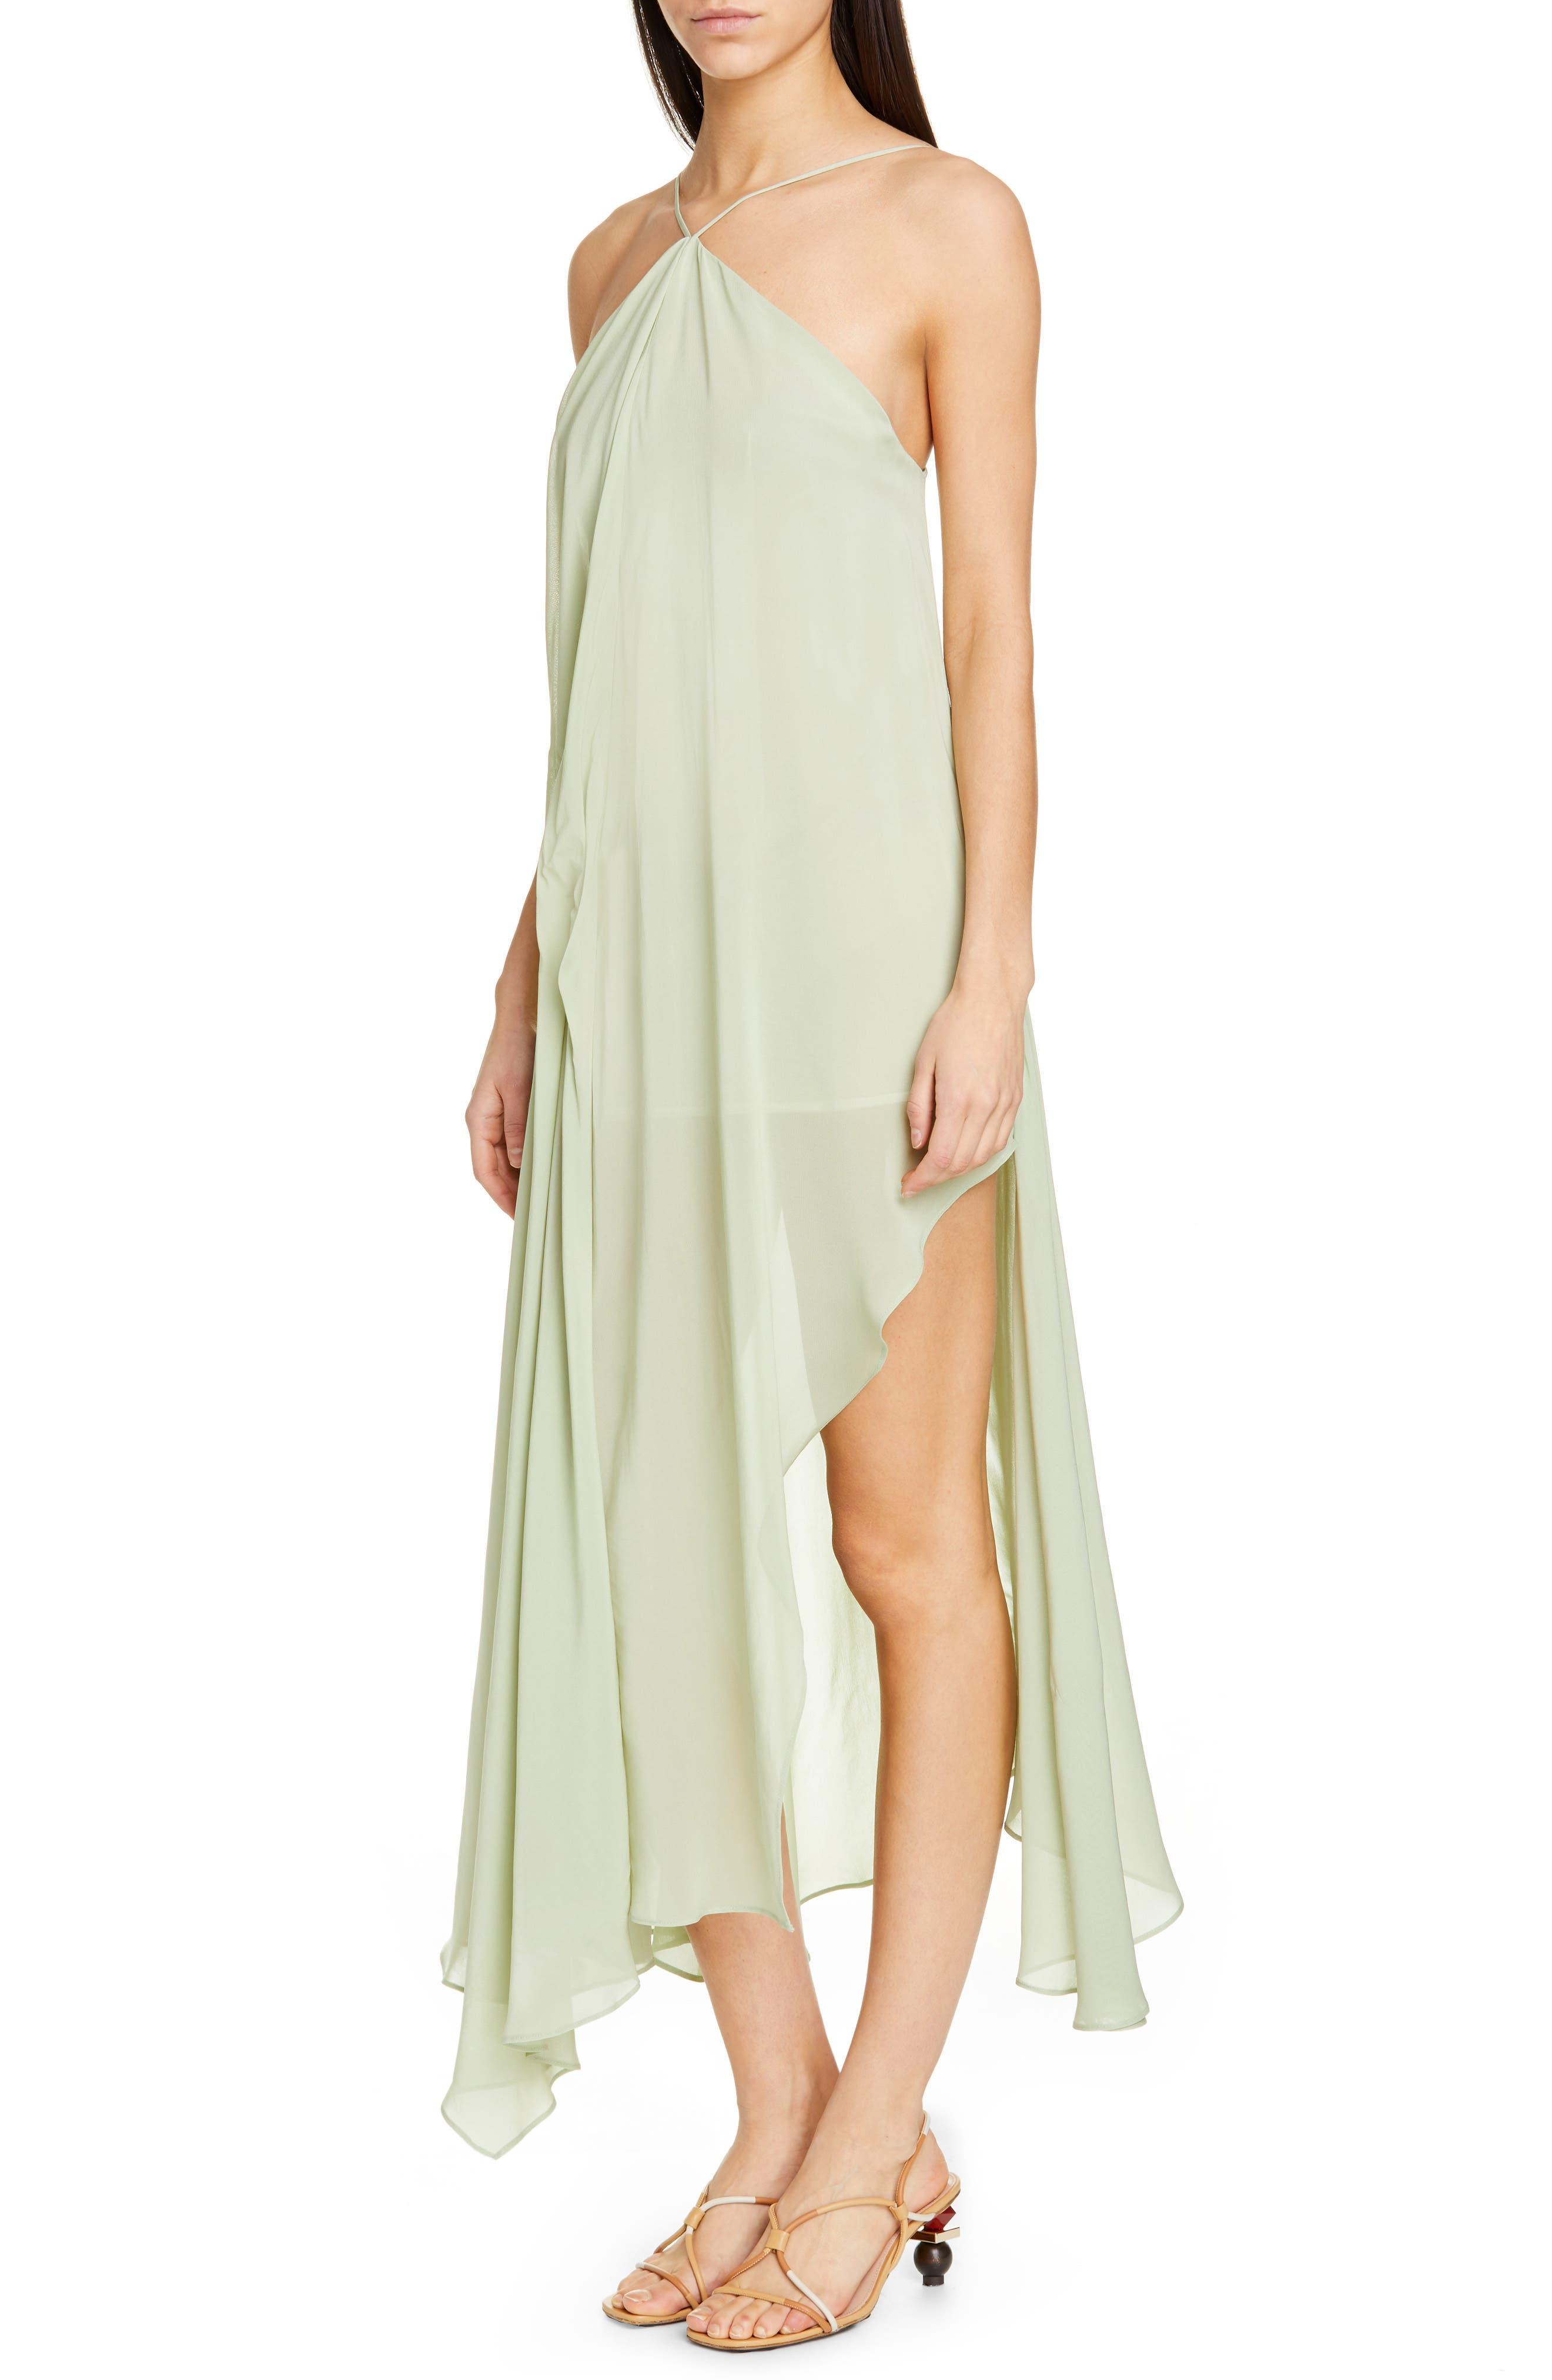 La Robe Spiaggia Halter Dress,                             Alternate thumbnail 4, color,                             LIGHT GREEN